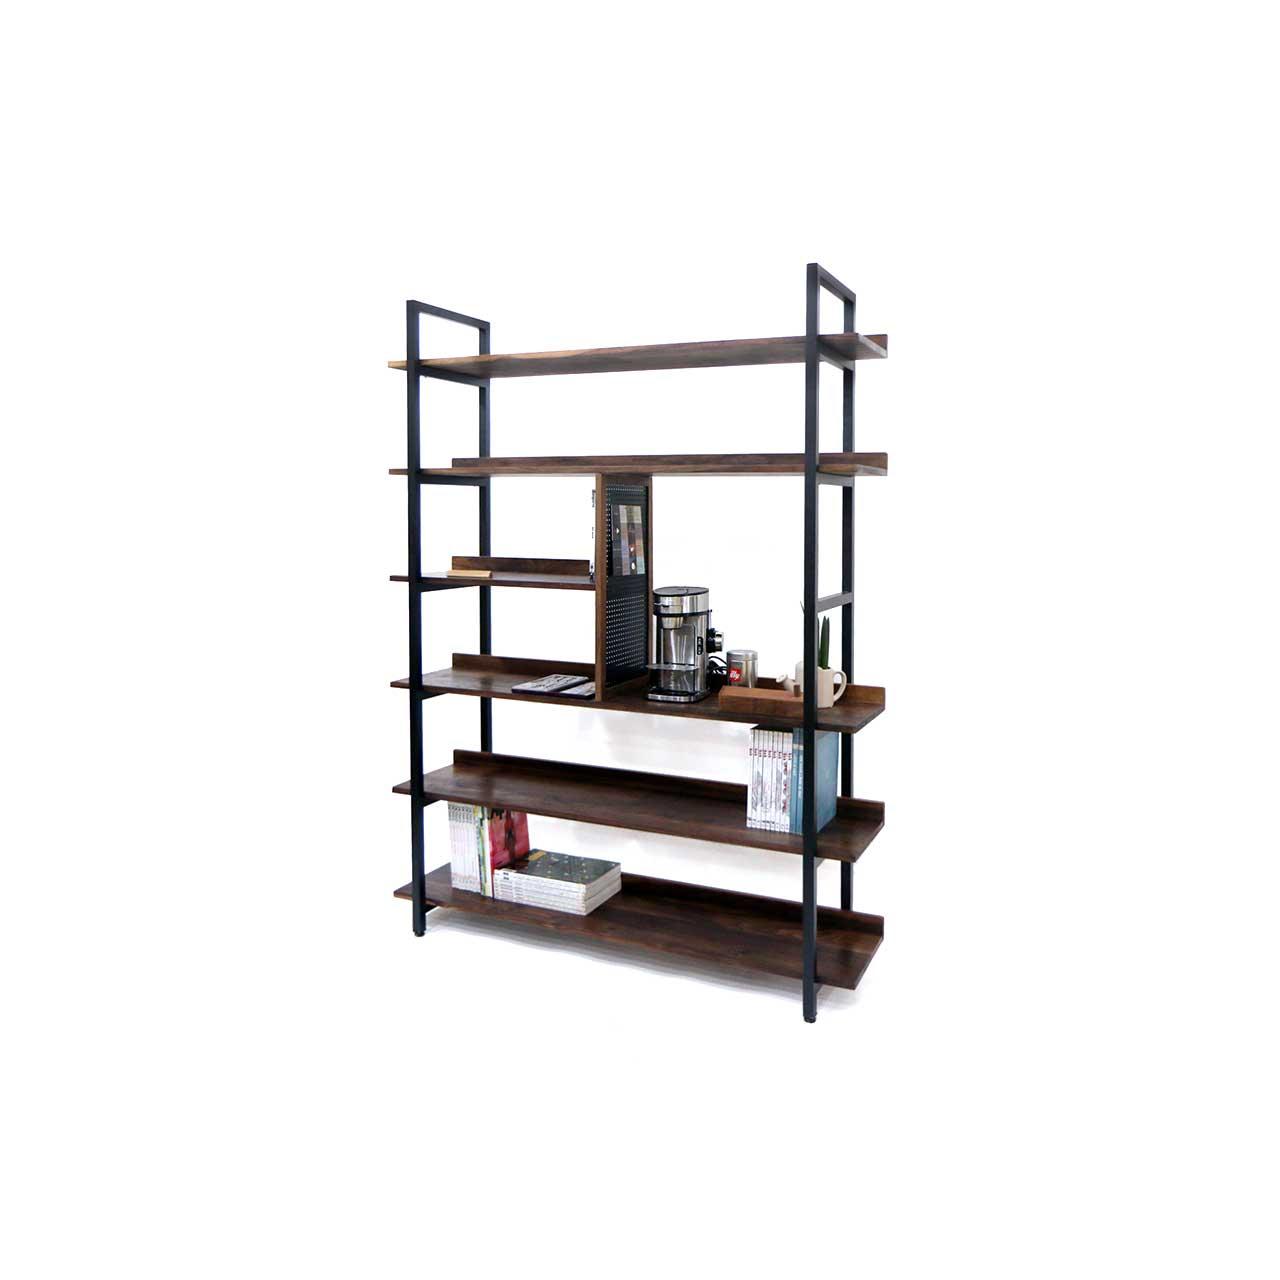 ALCOVE/Shelf 2.0